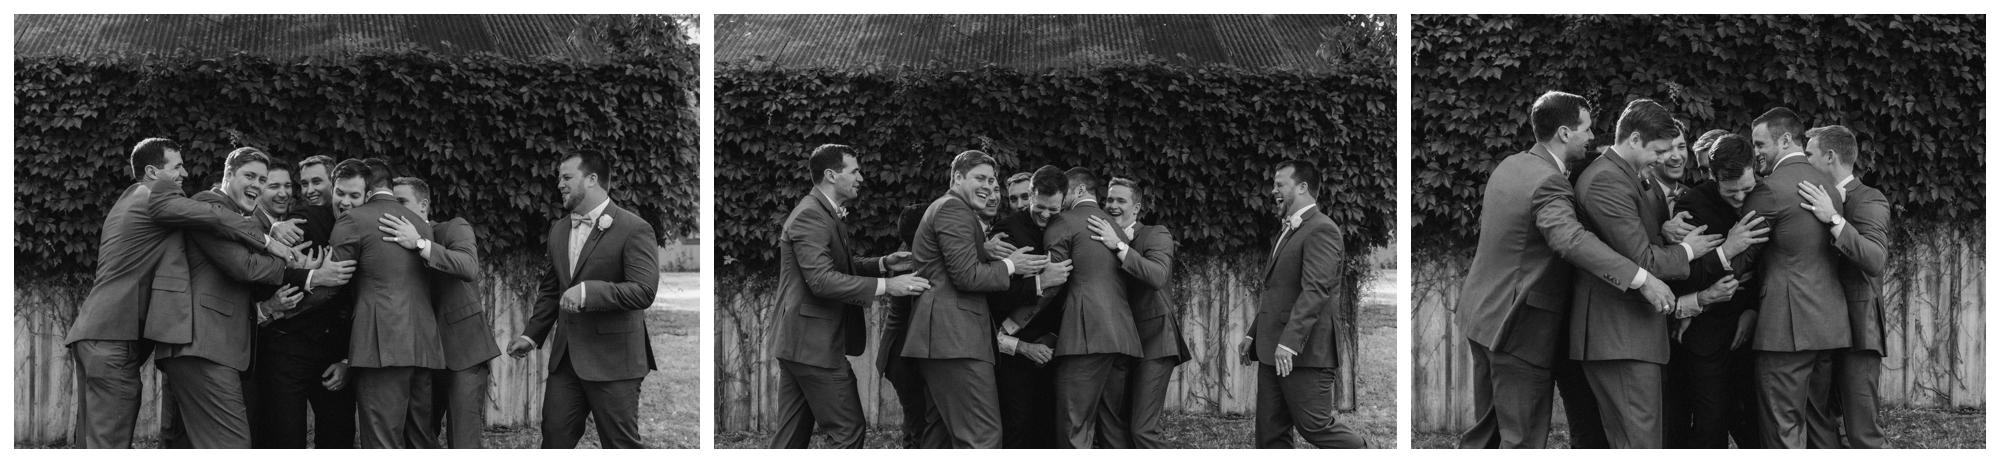 austin-texas-wedding-photography-1778-photographie_0081.jpg